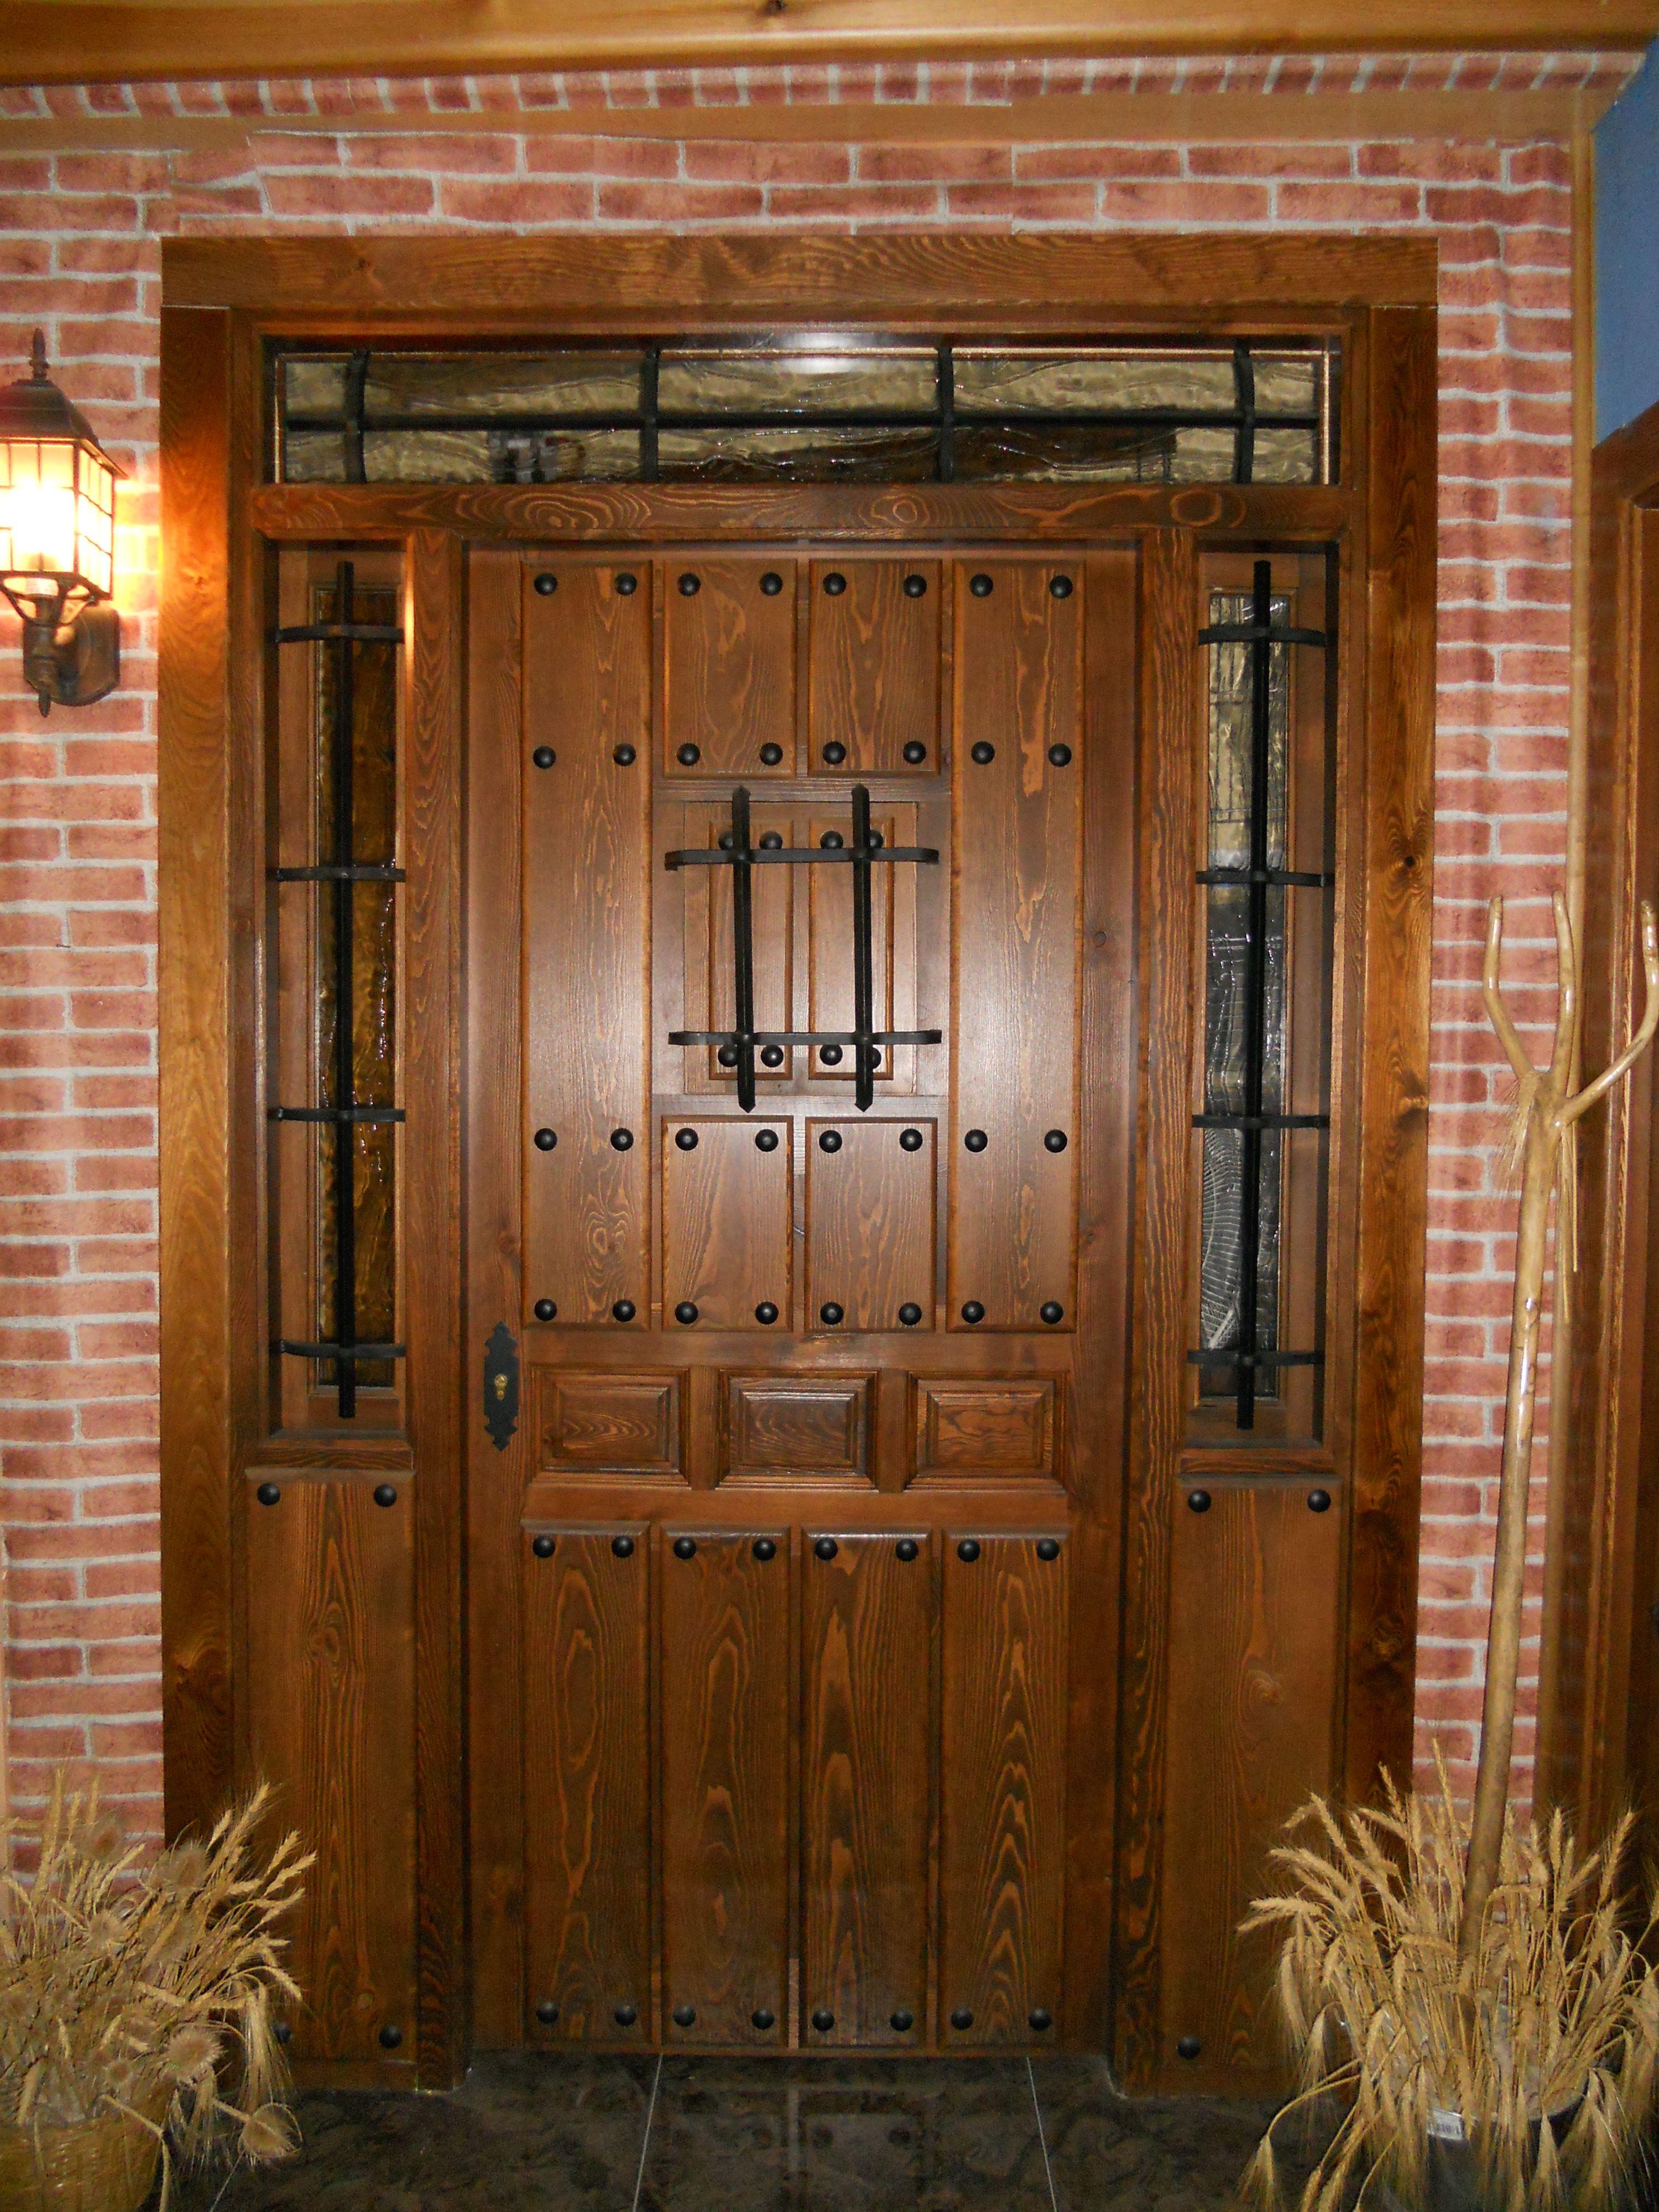 Puerta de entrada r stica para c s pinterest entrada r stica puerta de entrada y r stico - Rejas de forja antiguas ...